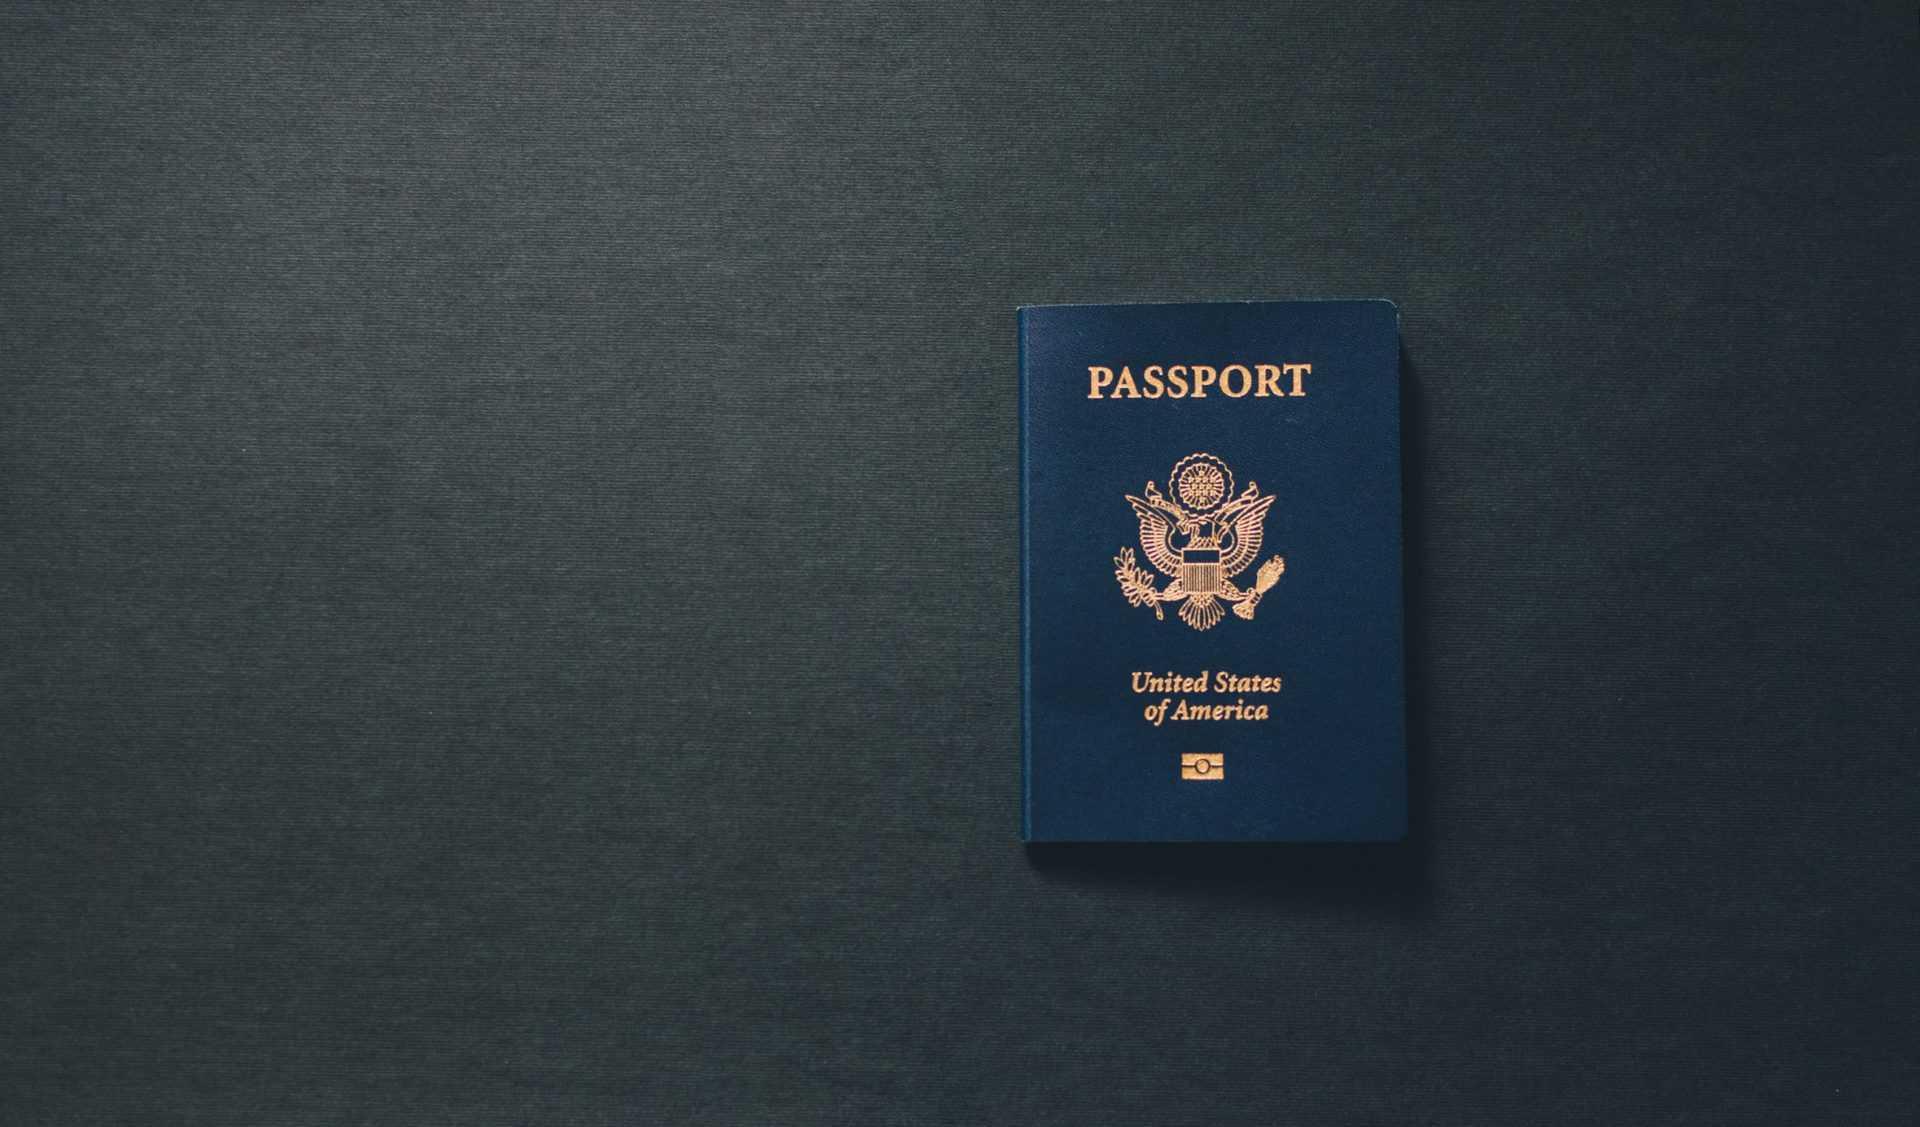 Covid Passport Page